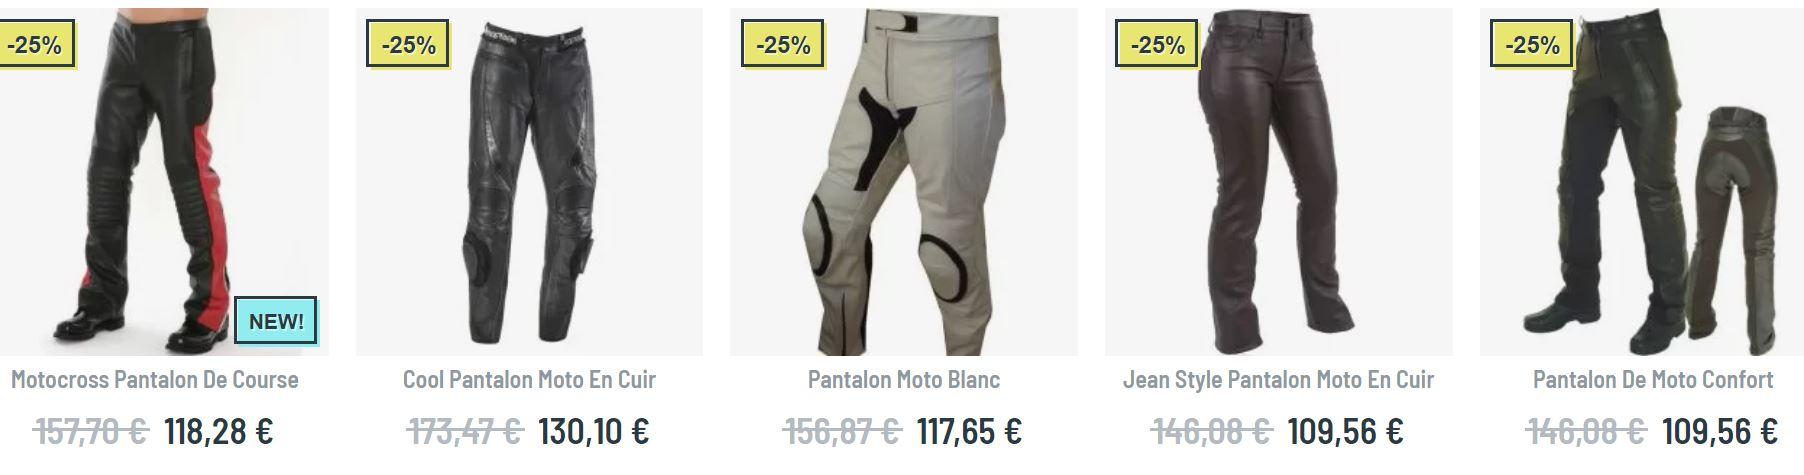 pantalon cuir moto